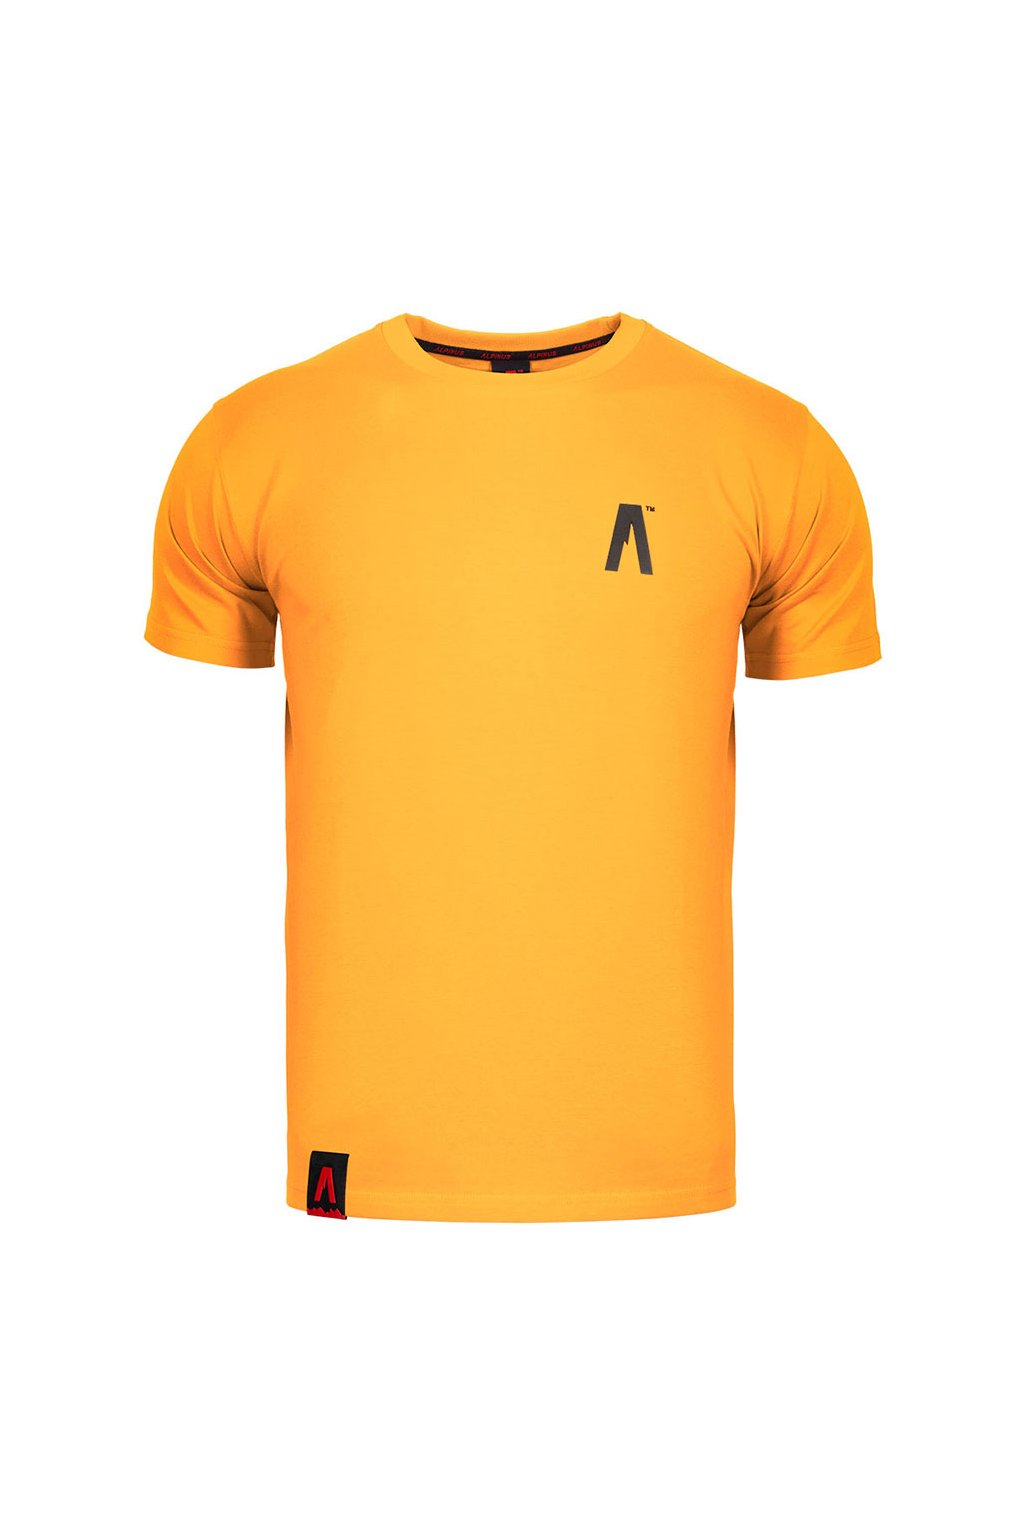 Pánske tričko Alpinus A' oranžové ALP20TC0002_ADD